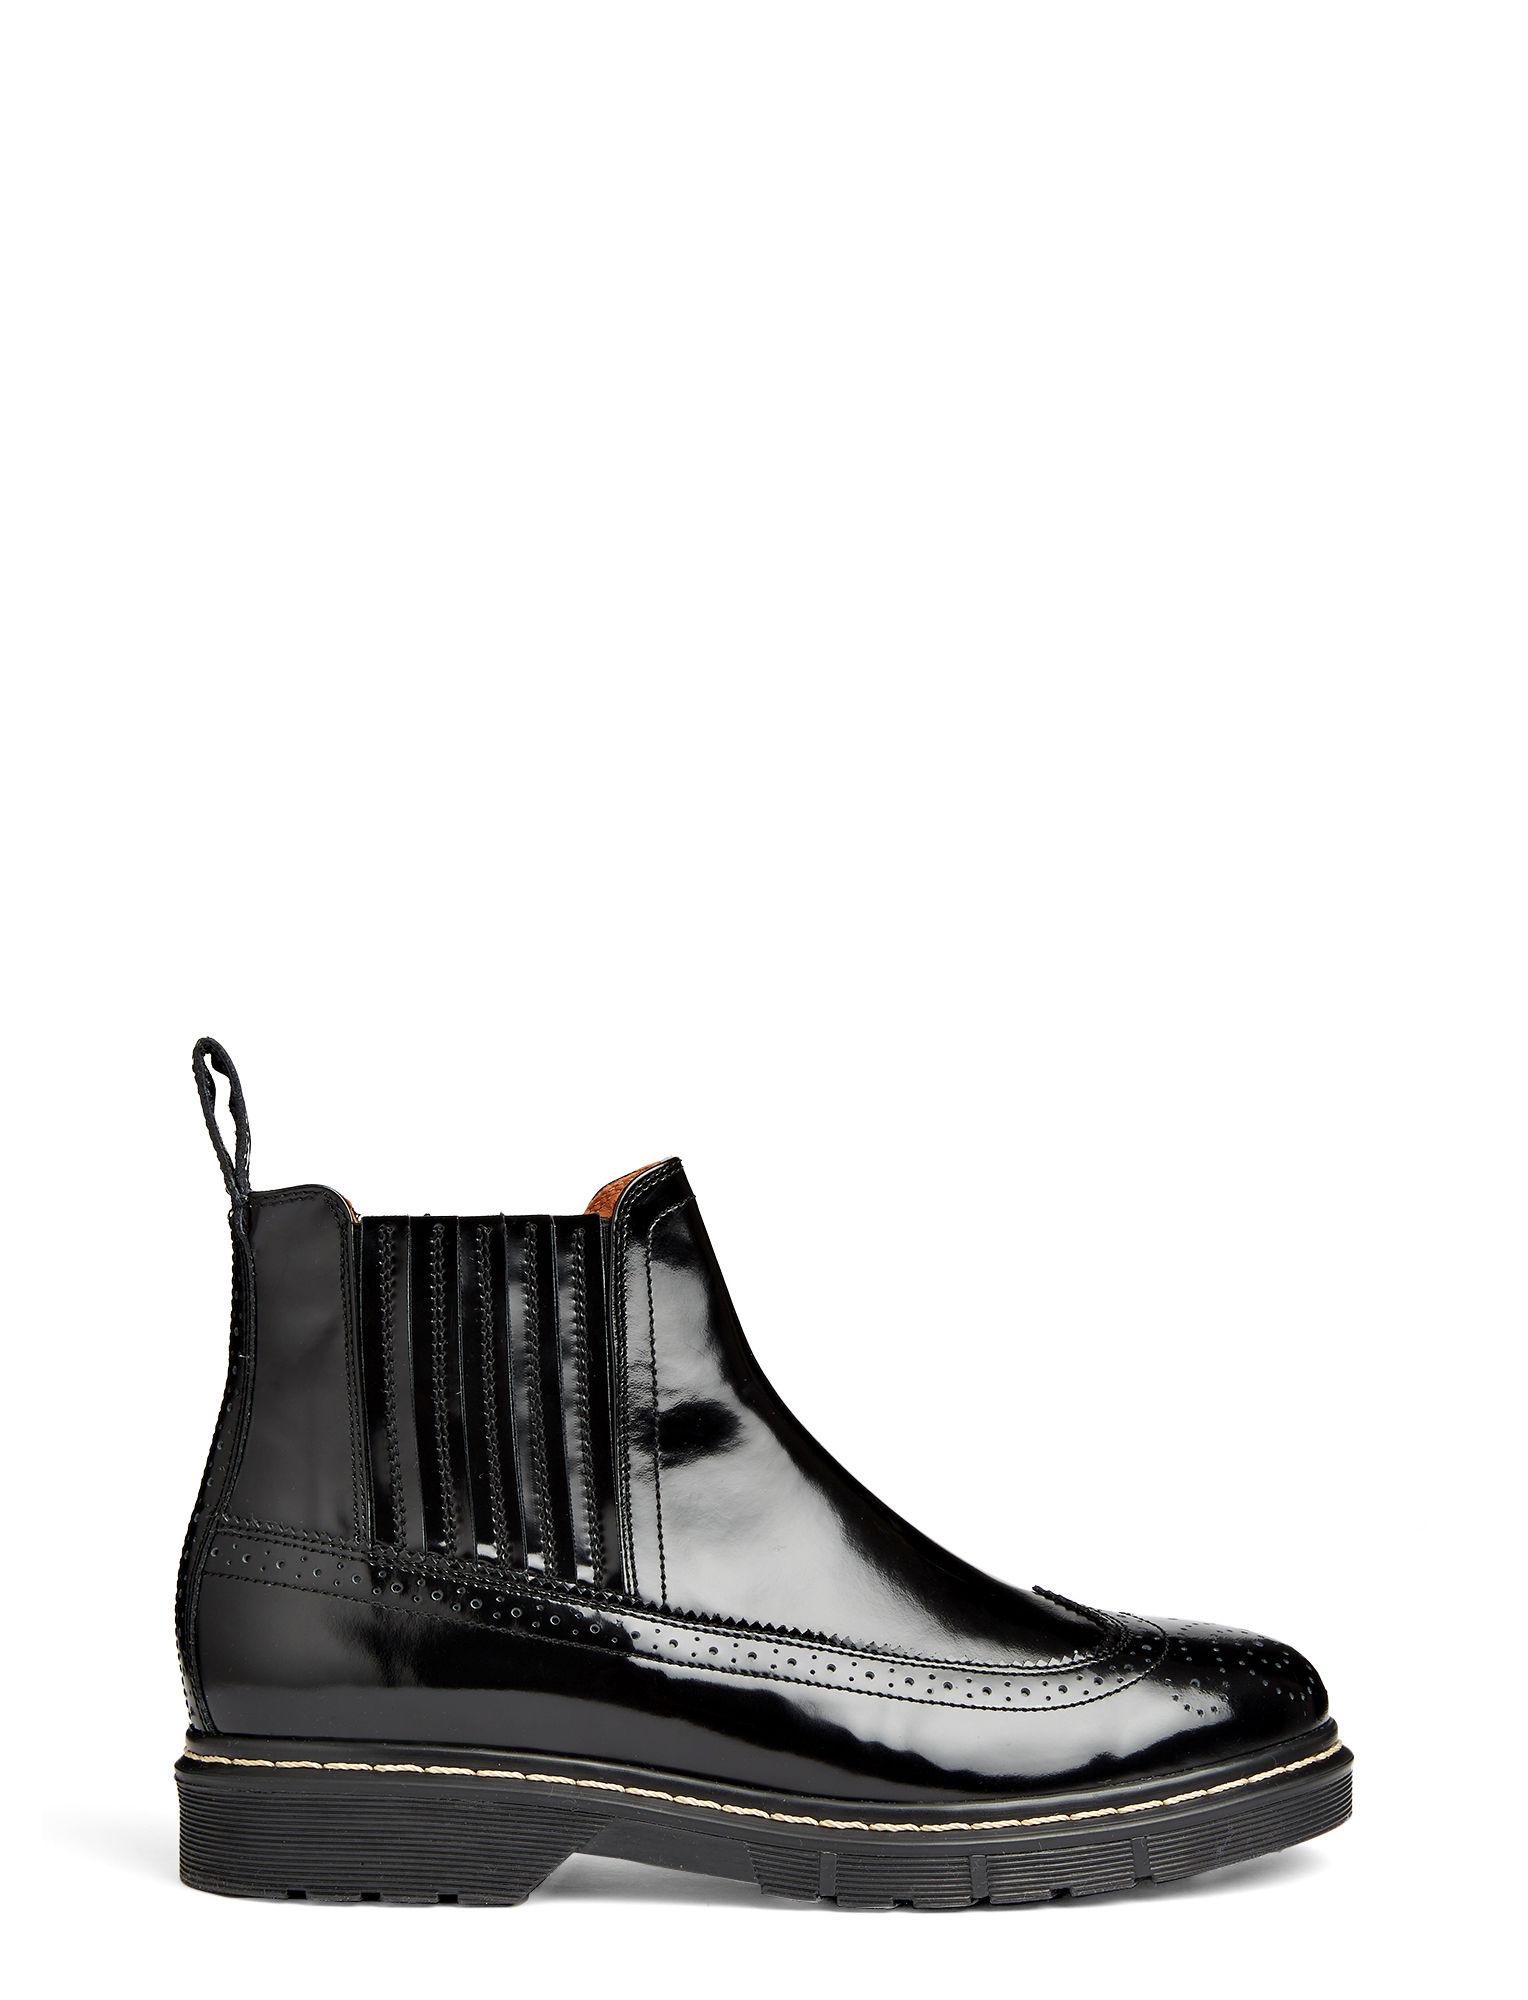 986c1eceec9 Stil Lux Brogue Boots